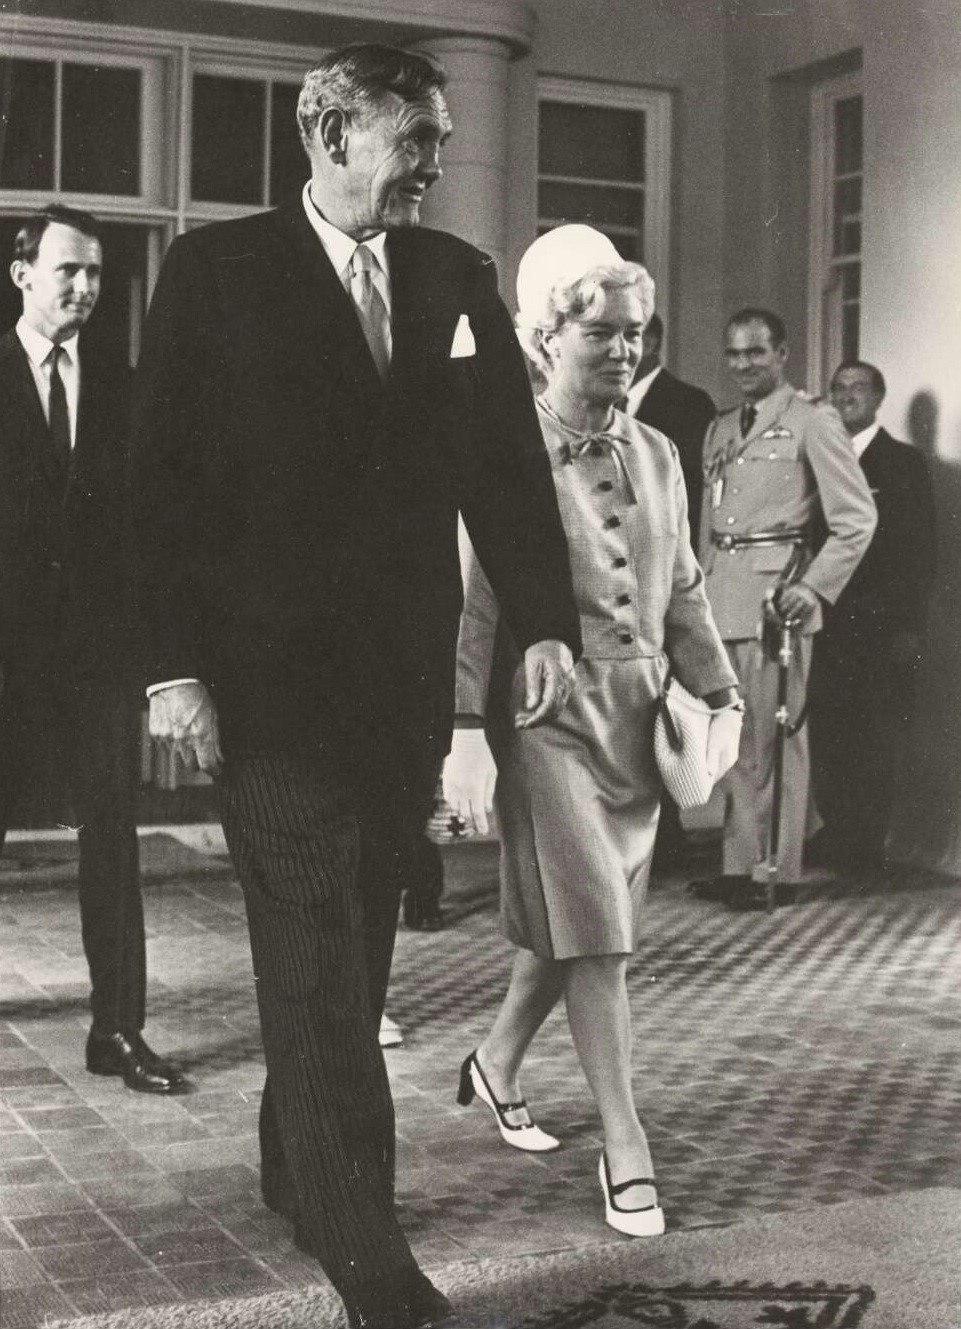 John and Bettina Gorton